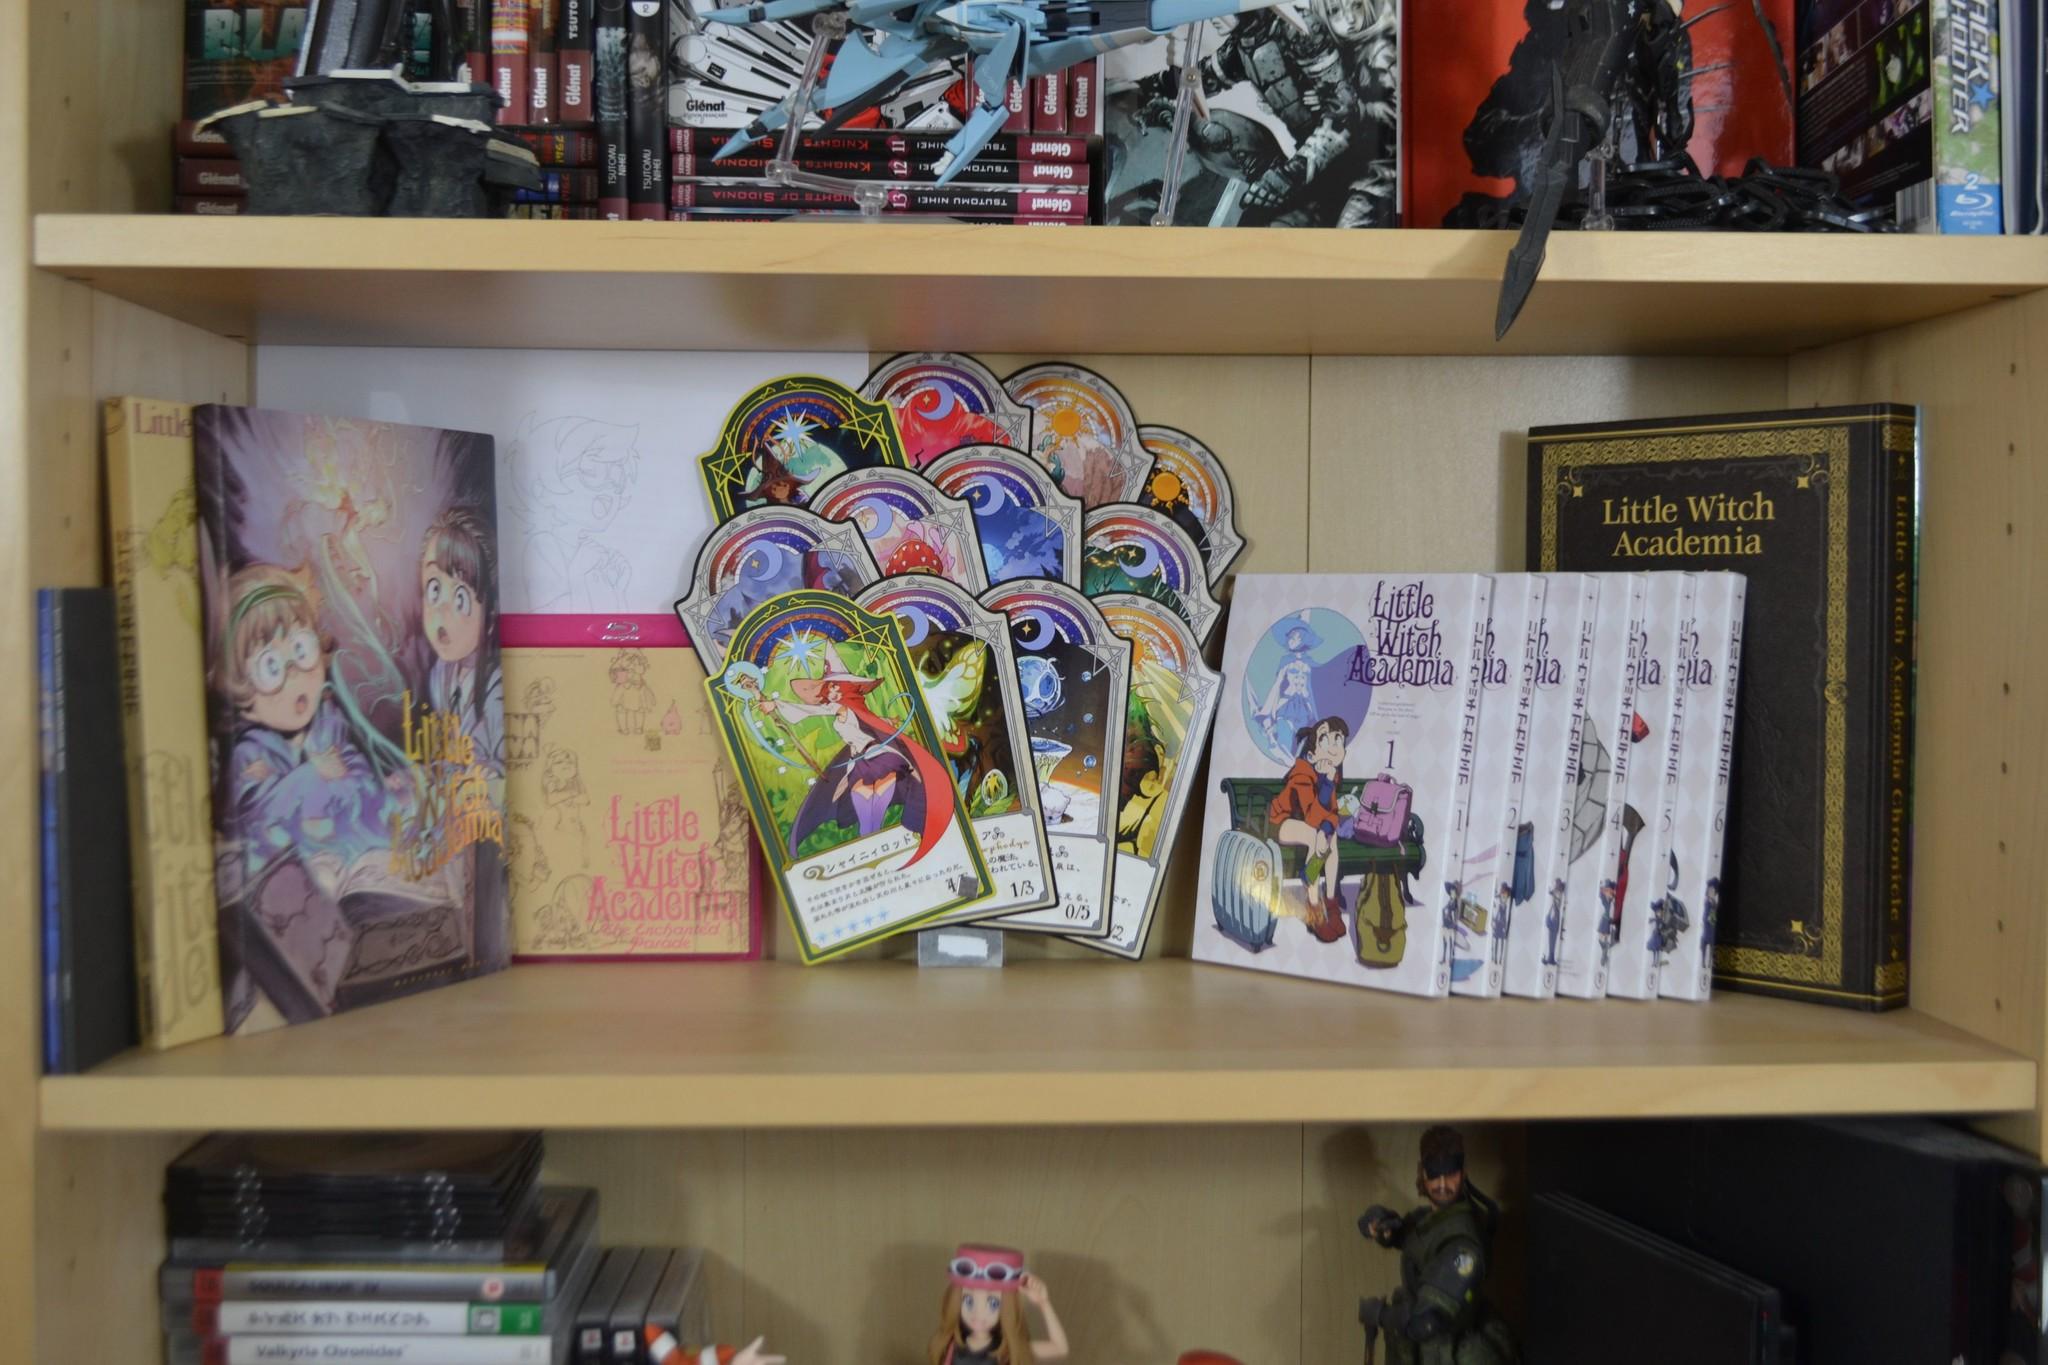 trigger toho kadokawa yoshinari_you fan_book blu-ray hikasa_youko orikasa_fumiko anime_official_guide_book little_witch_academia han_megumi hard_cover handa_shuuhei murase_michiyo